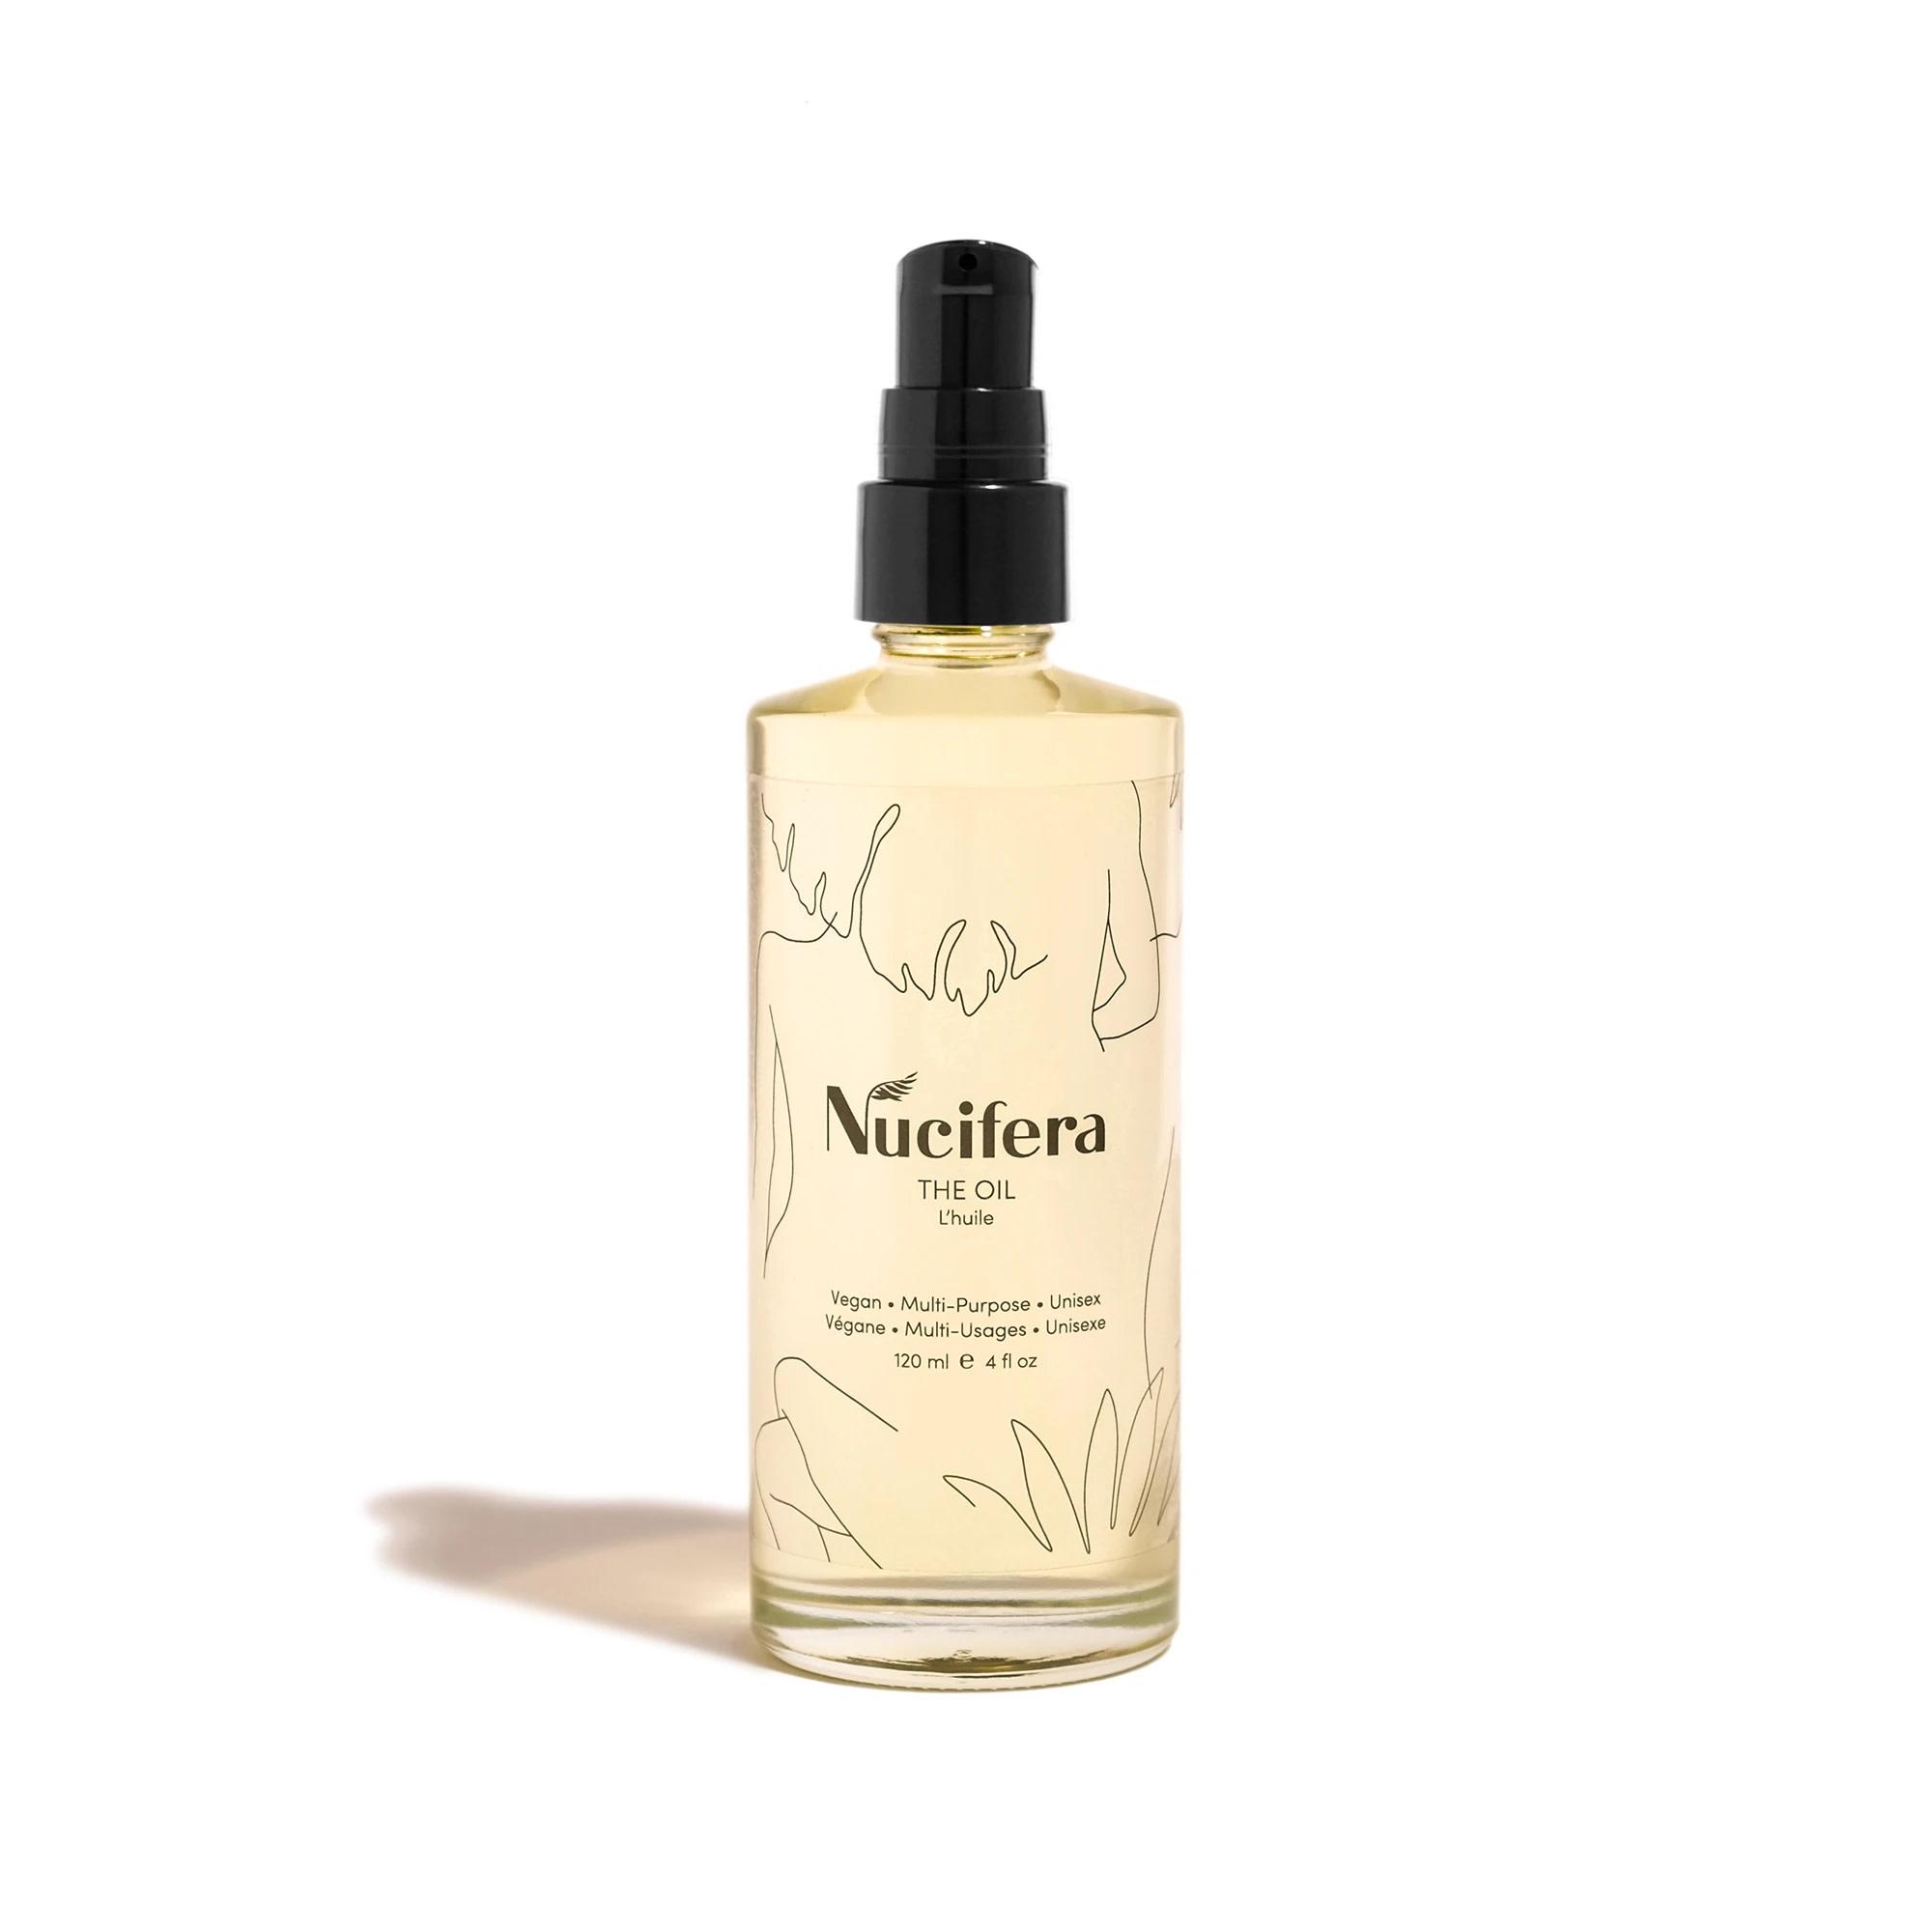 Nucifera - NU The Oil